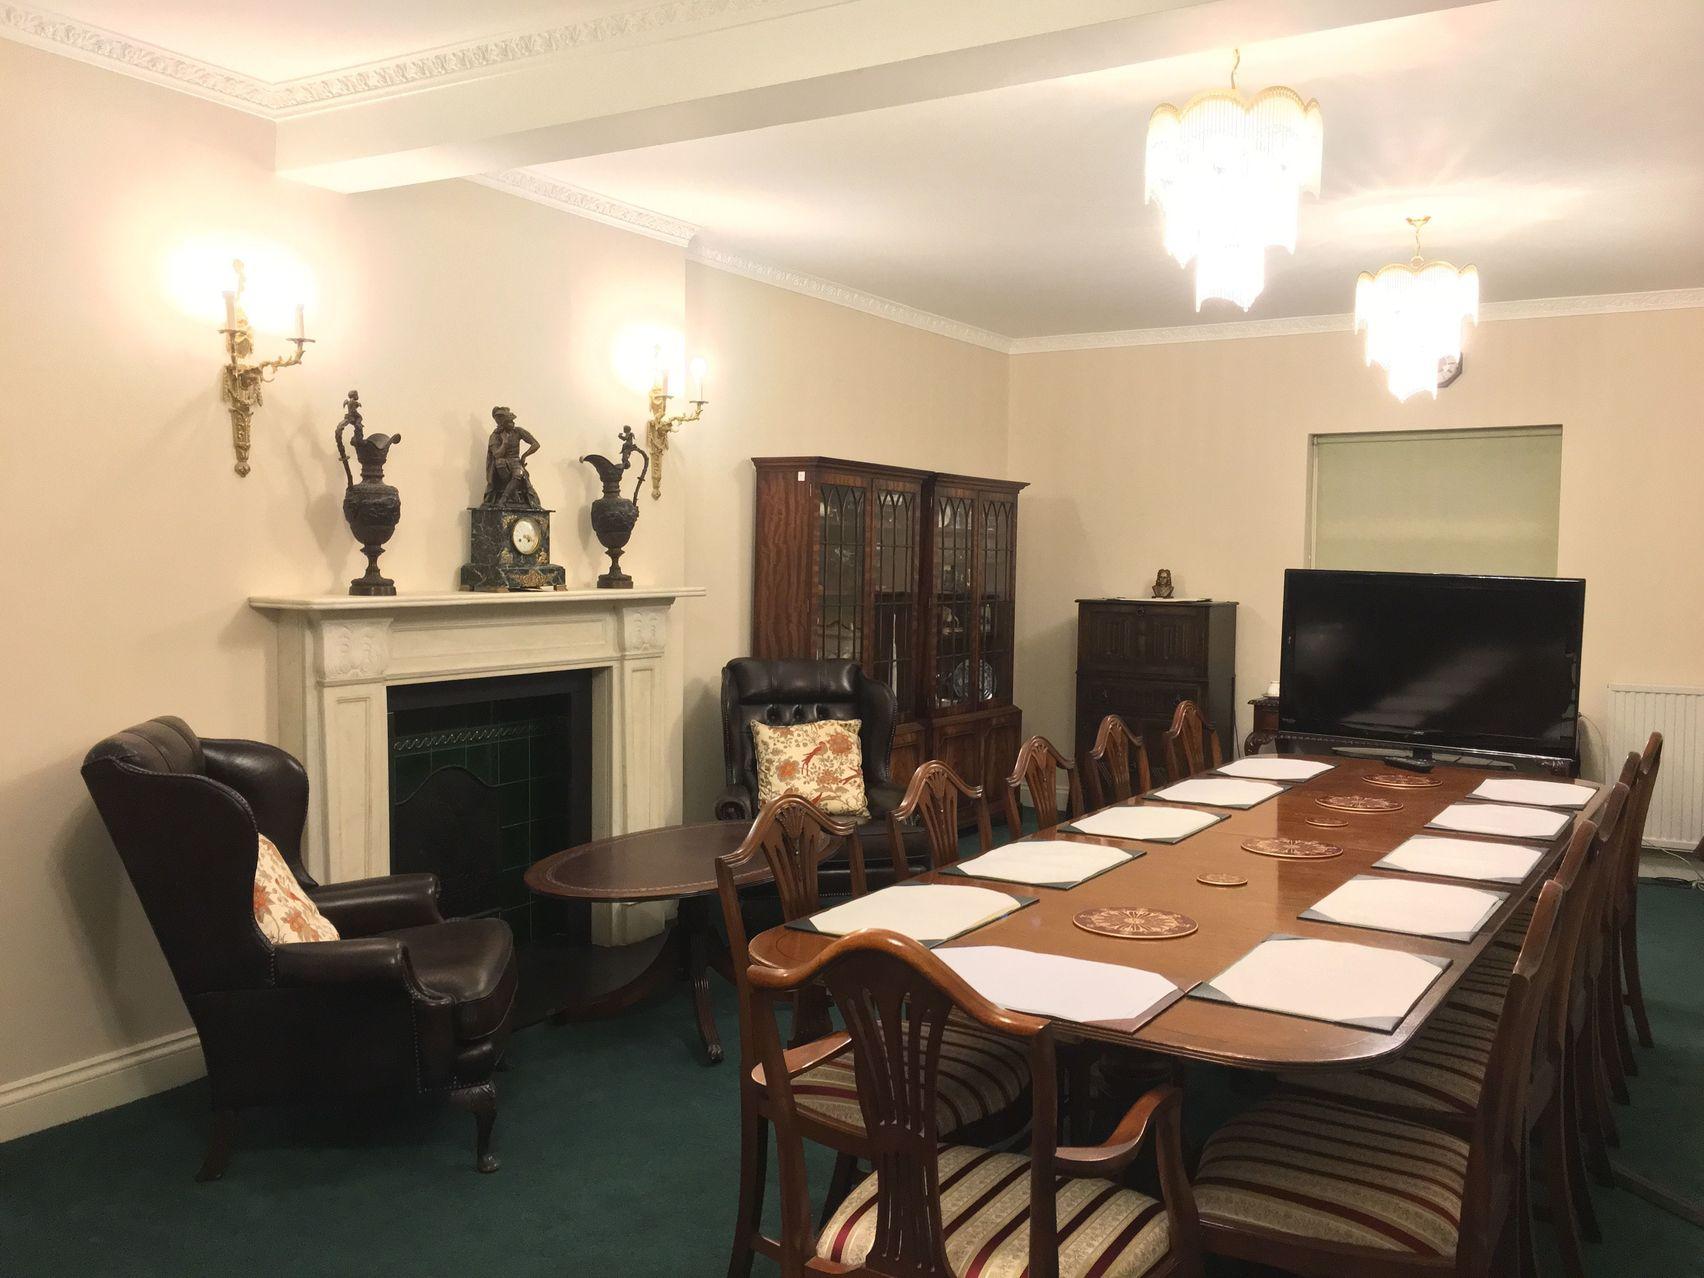 Board Room, The British Interplanetary Society